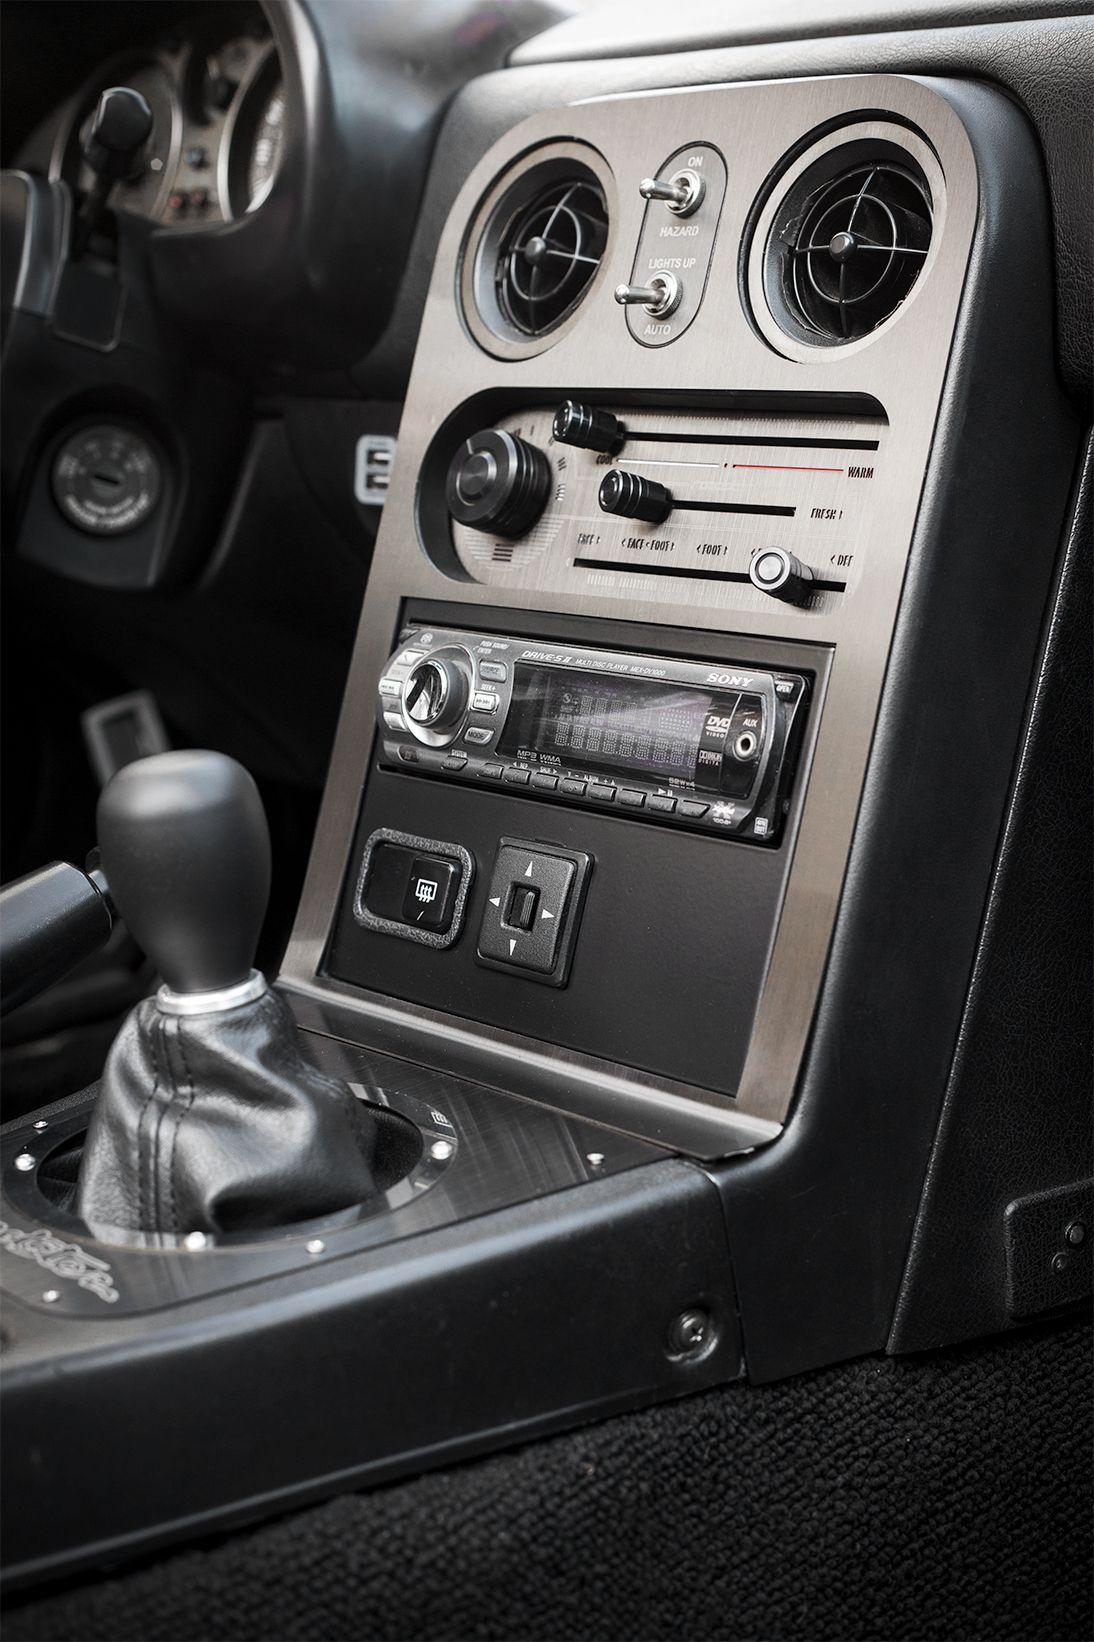 Black Brushed Stainless Steel Tombstone Cover Na Miata Mazda Miata Miata Mx5